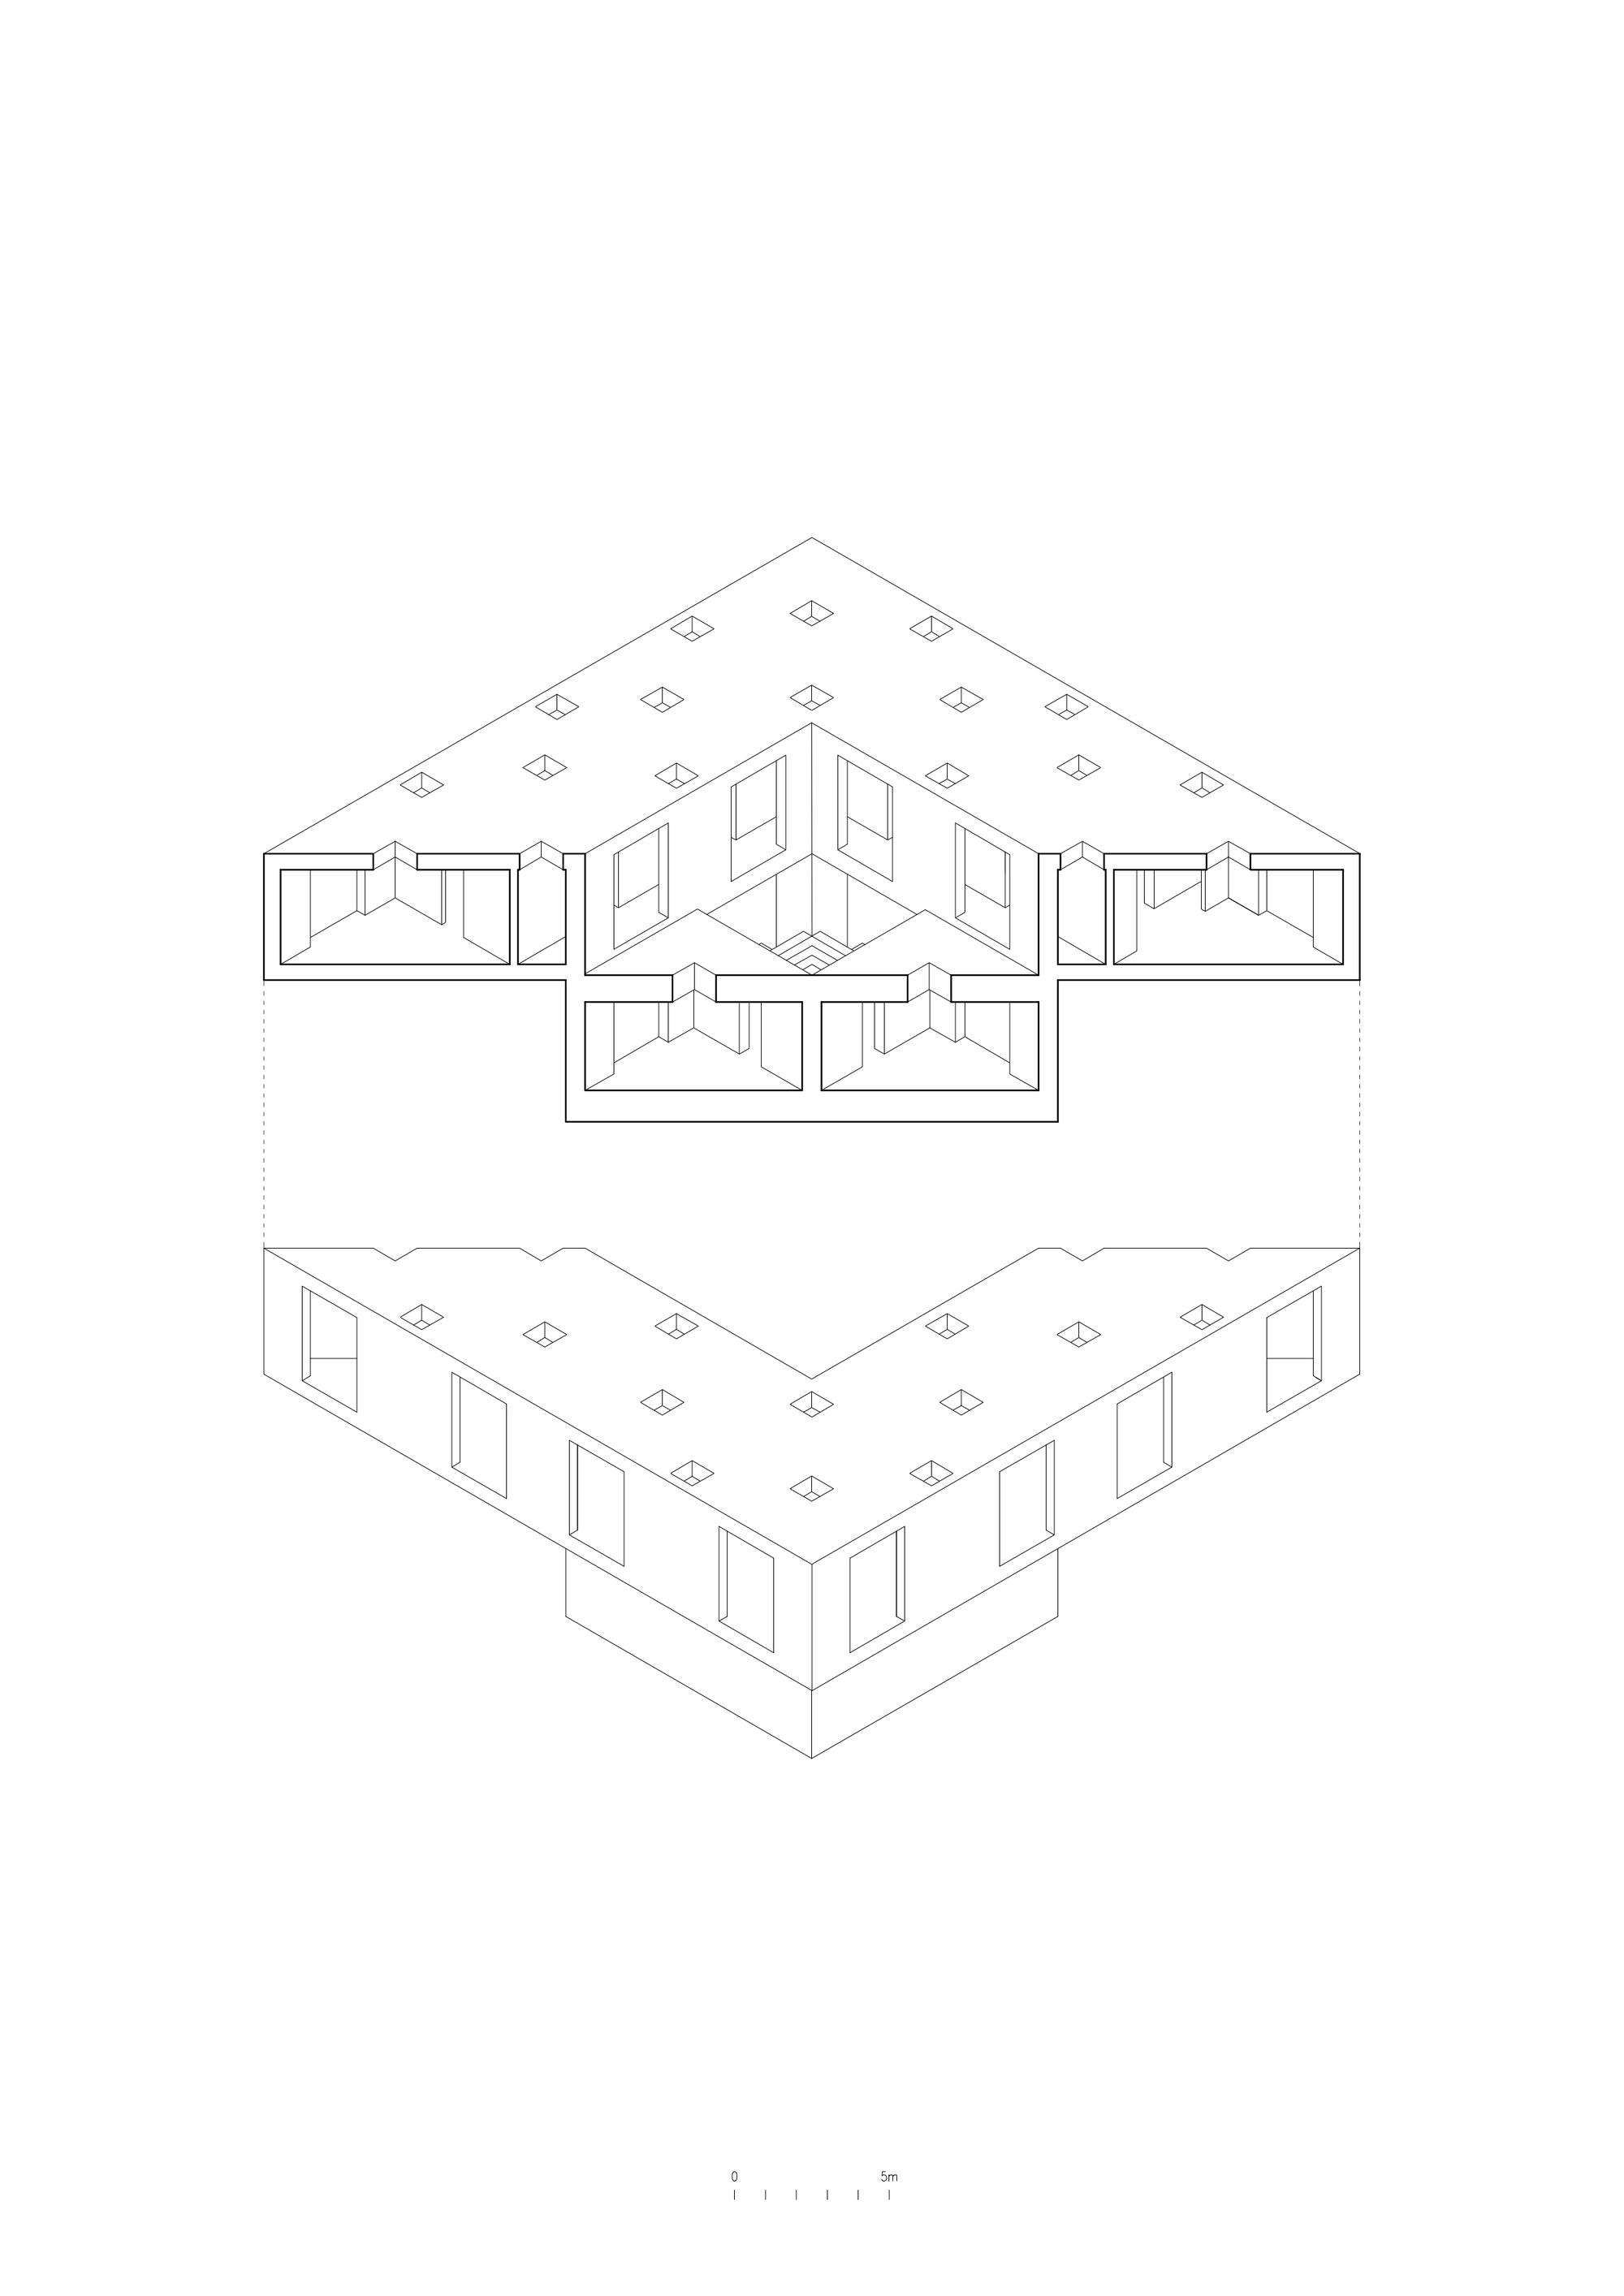 54aaf720e58eceffe50000b9_guna-house-pezo-von-ellrichshausen_pve_guna_02_axo1